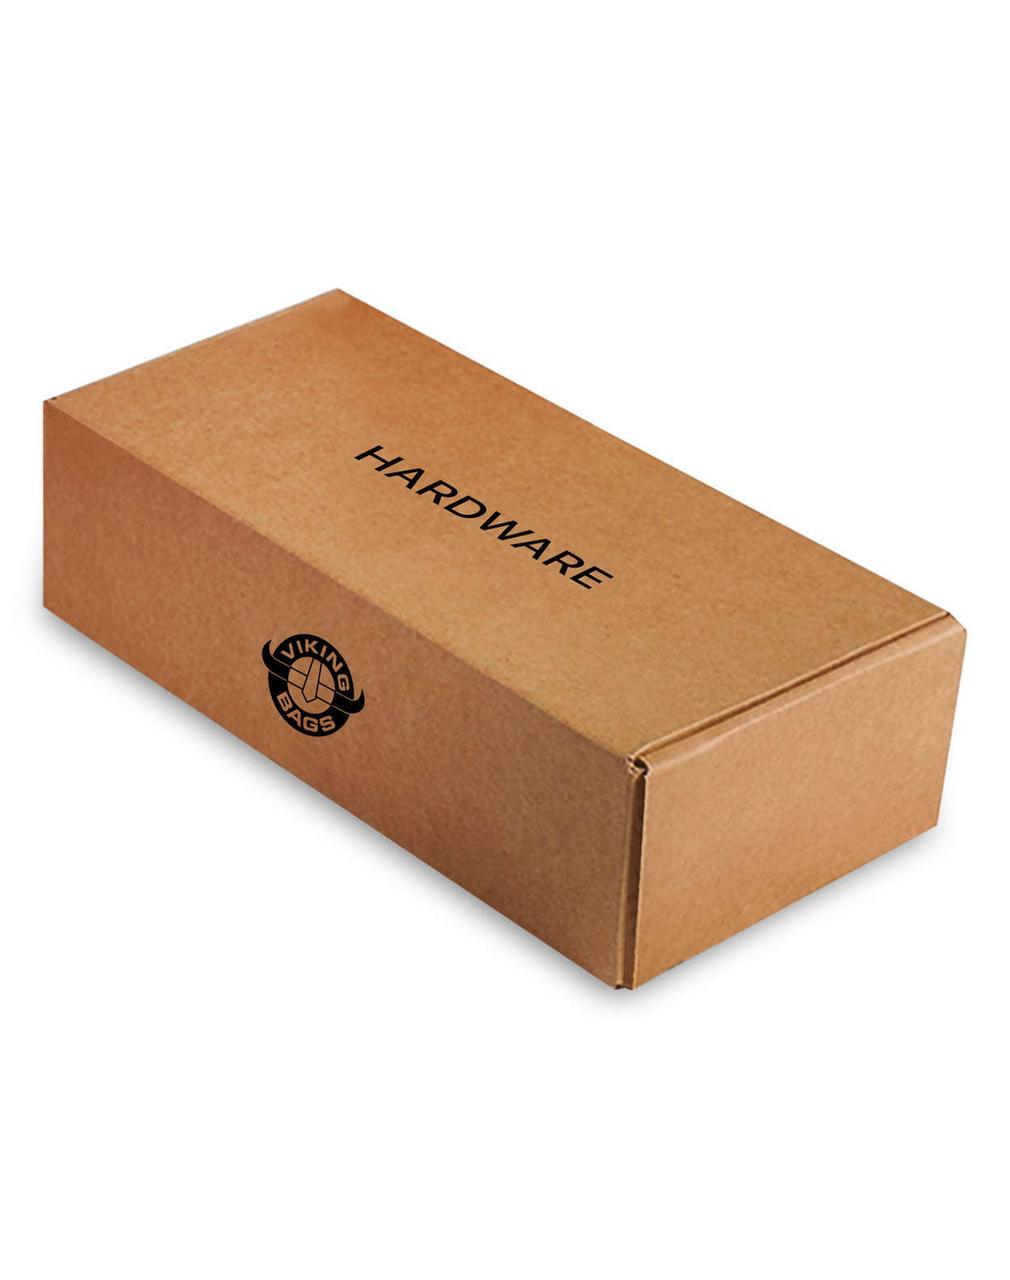 Honda VTX 1800 N Trianon Plain Leather Motorcycle Saddlebags Box